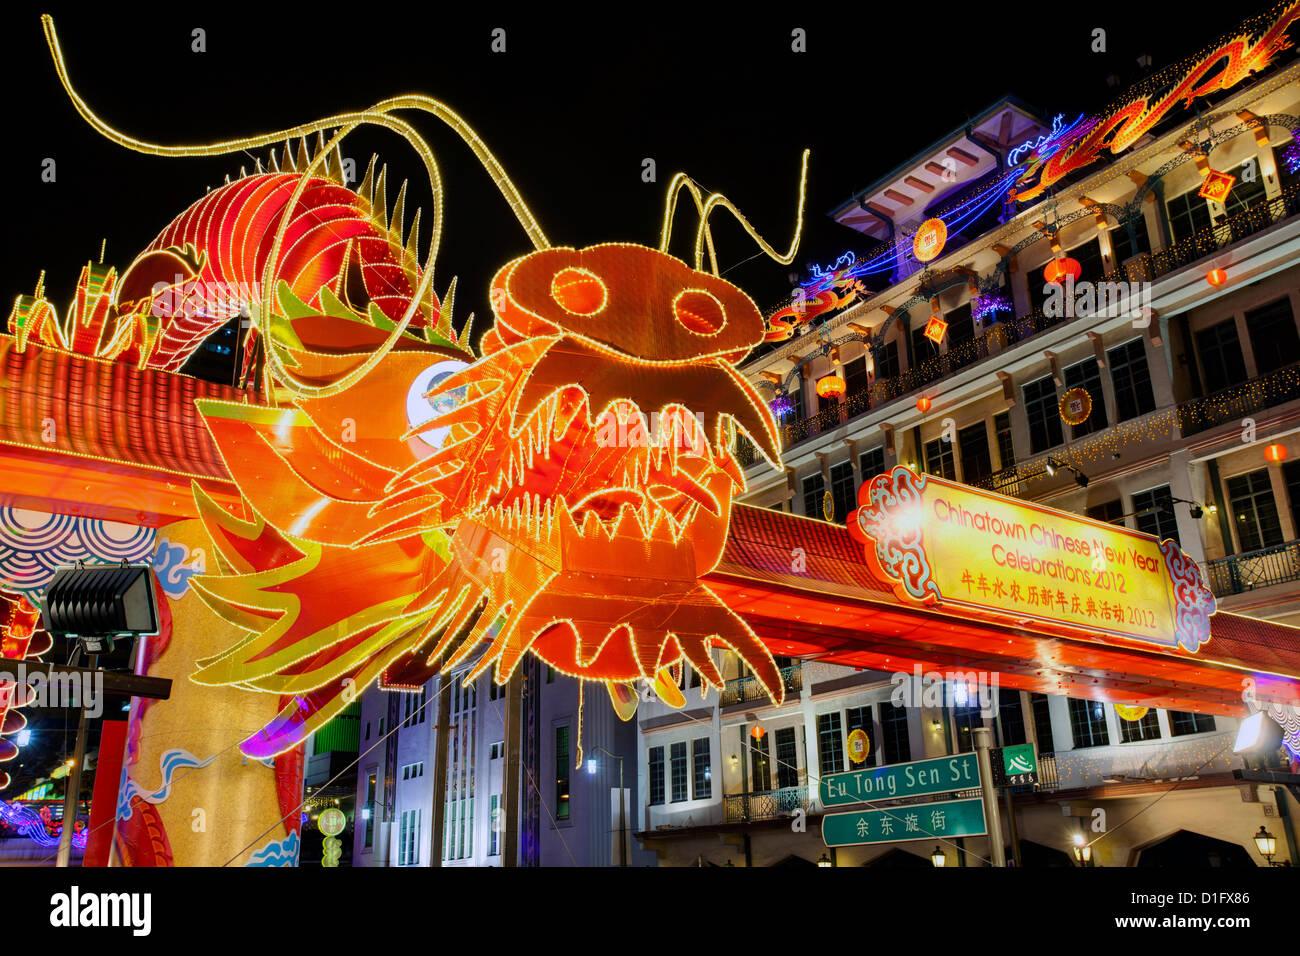 Celebraciones del Año Nuevo Chino, New Bridge Road, Chinatown, Singapur, Sudeste de Asia, Asia Imagen De Stock